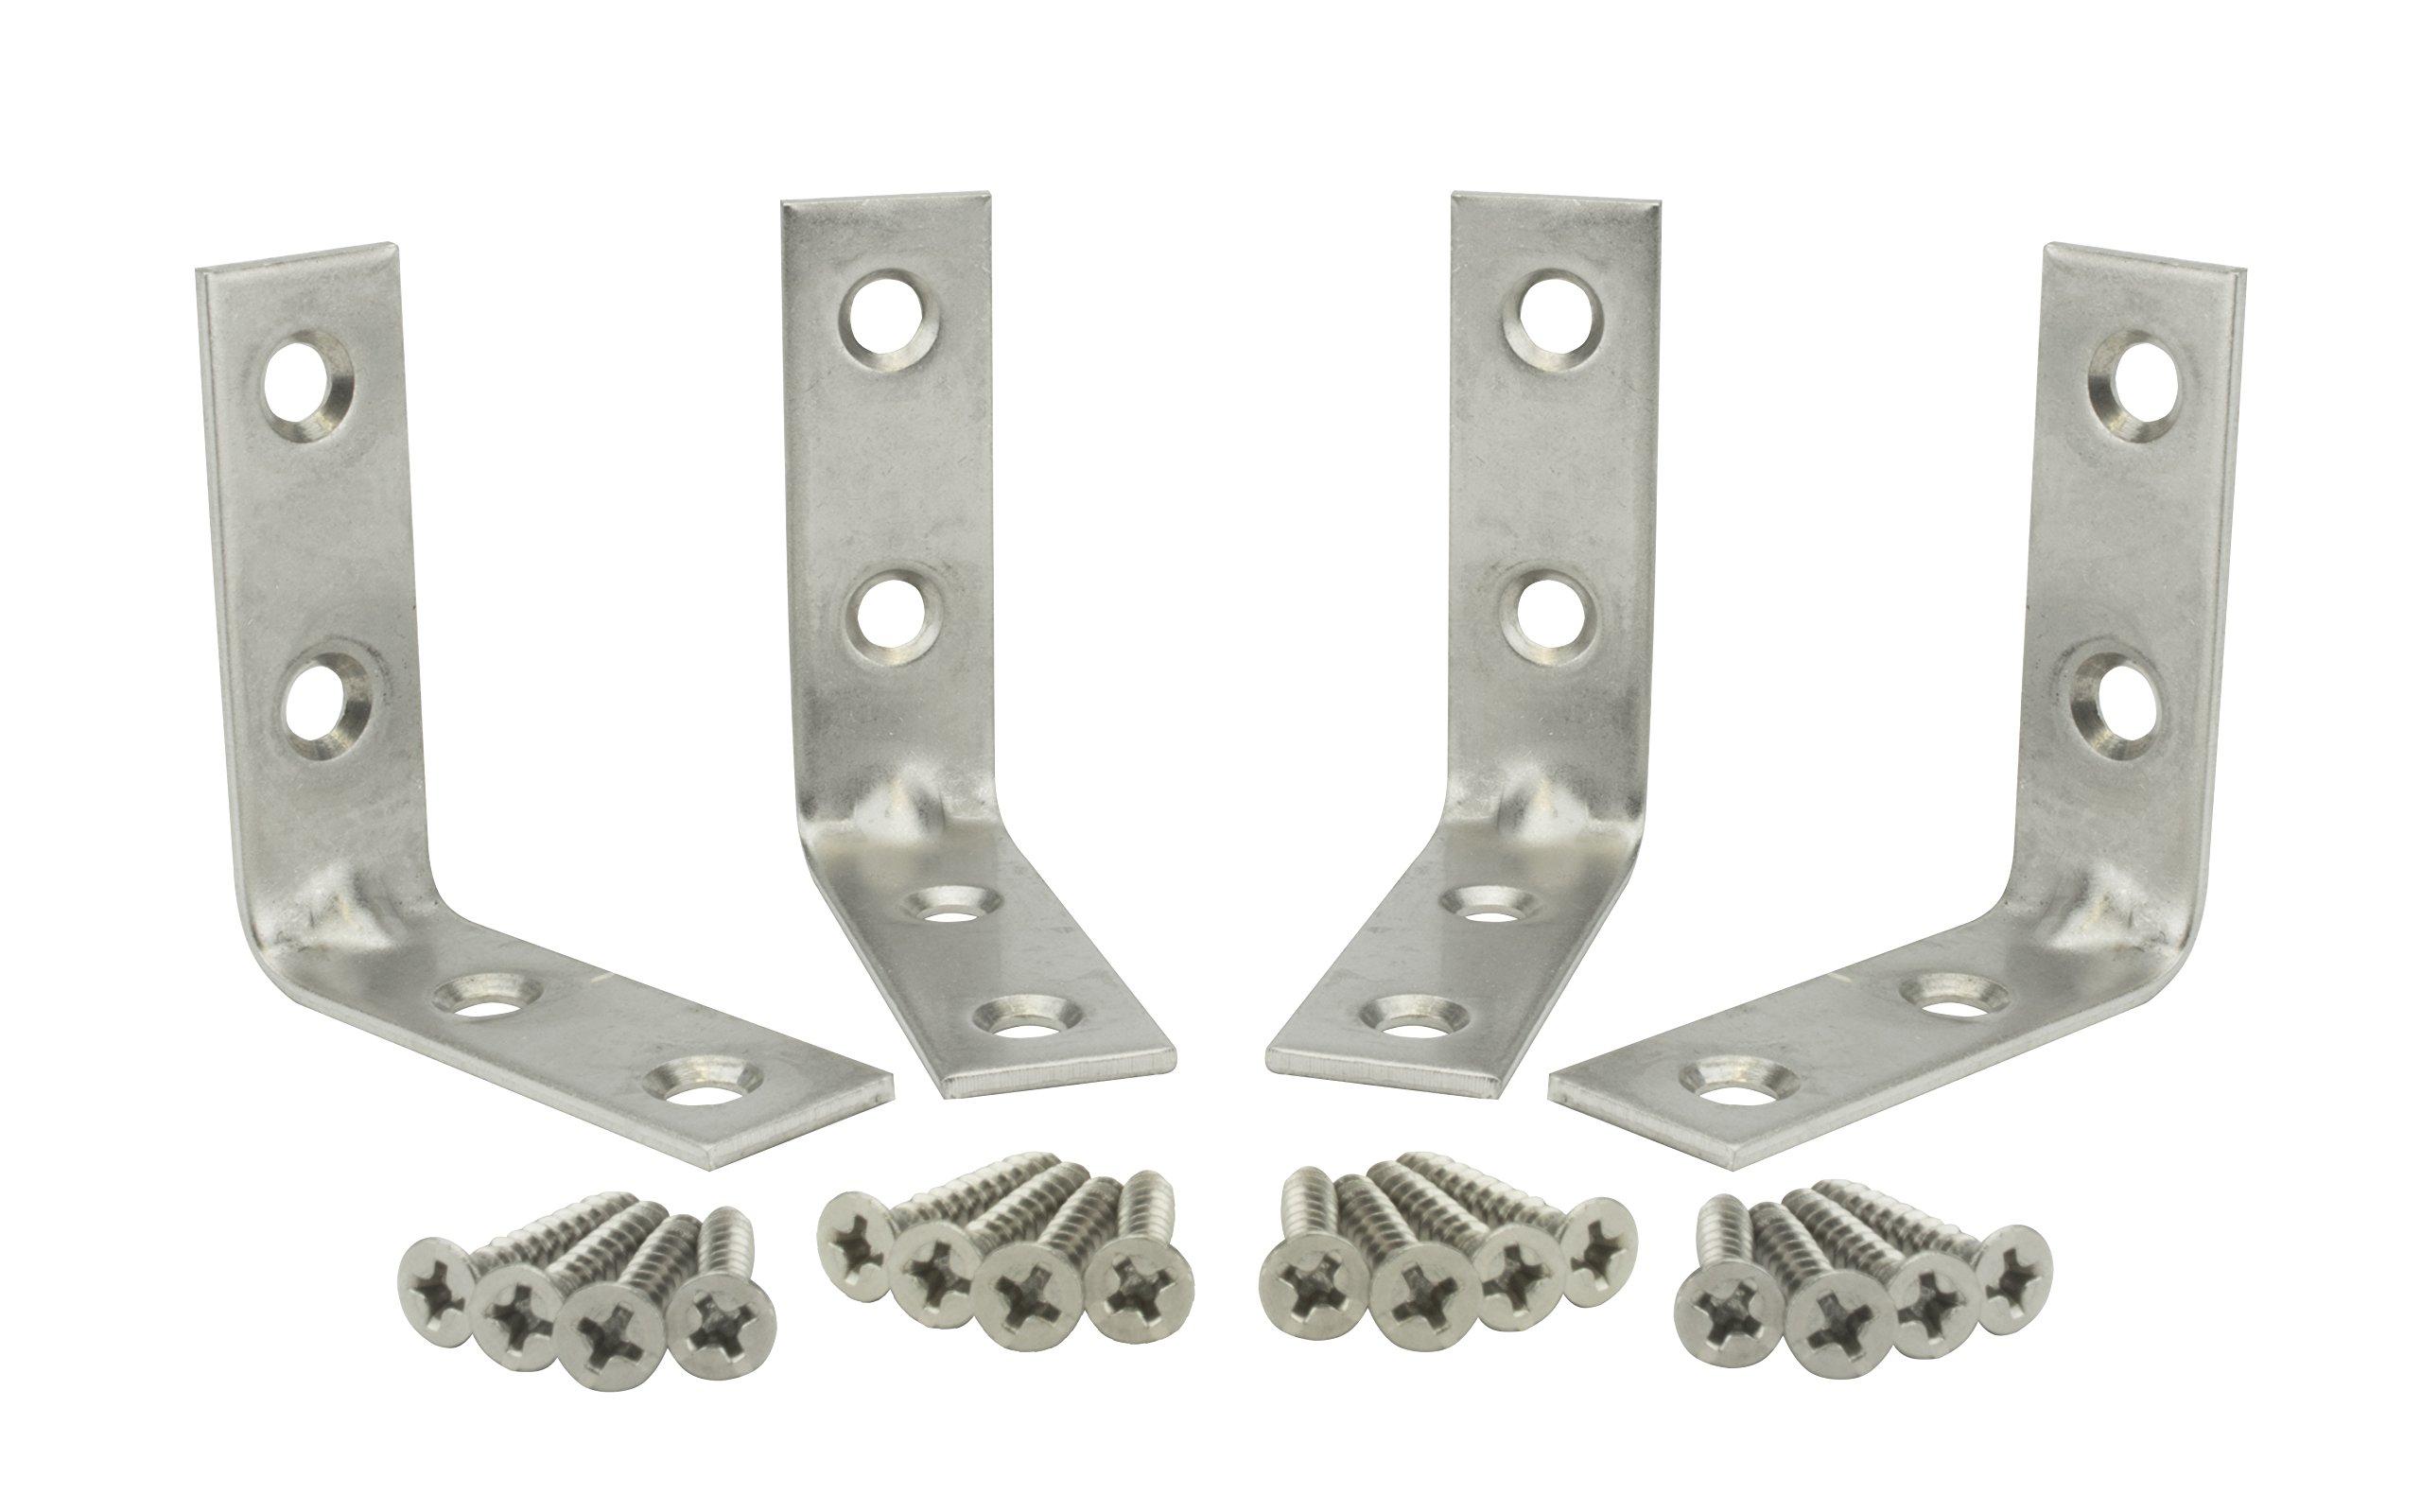 Specialty Hardware Corner Brace 2 inch Stainless Steel 120pcs